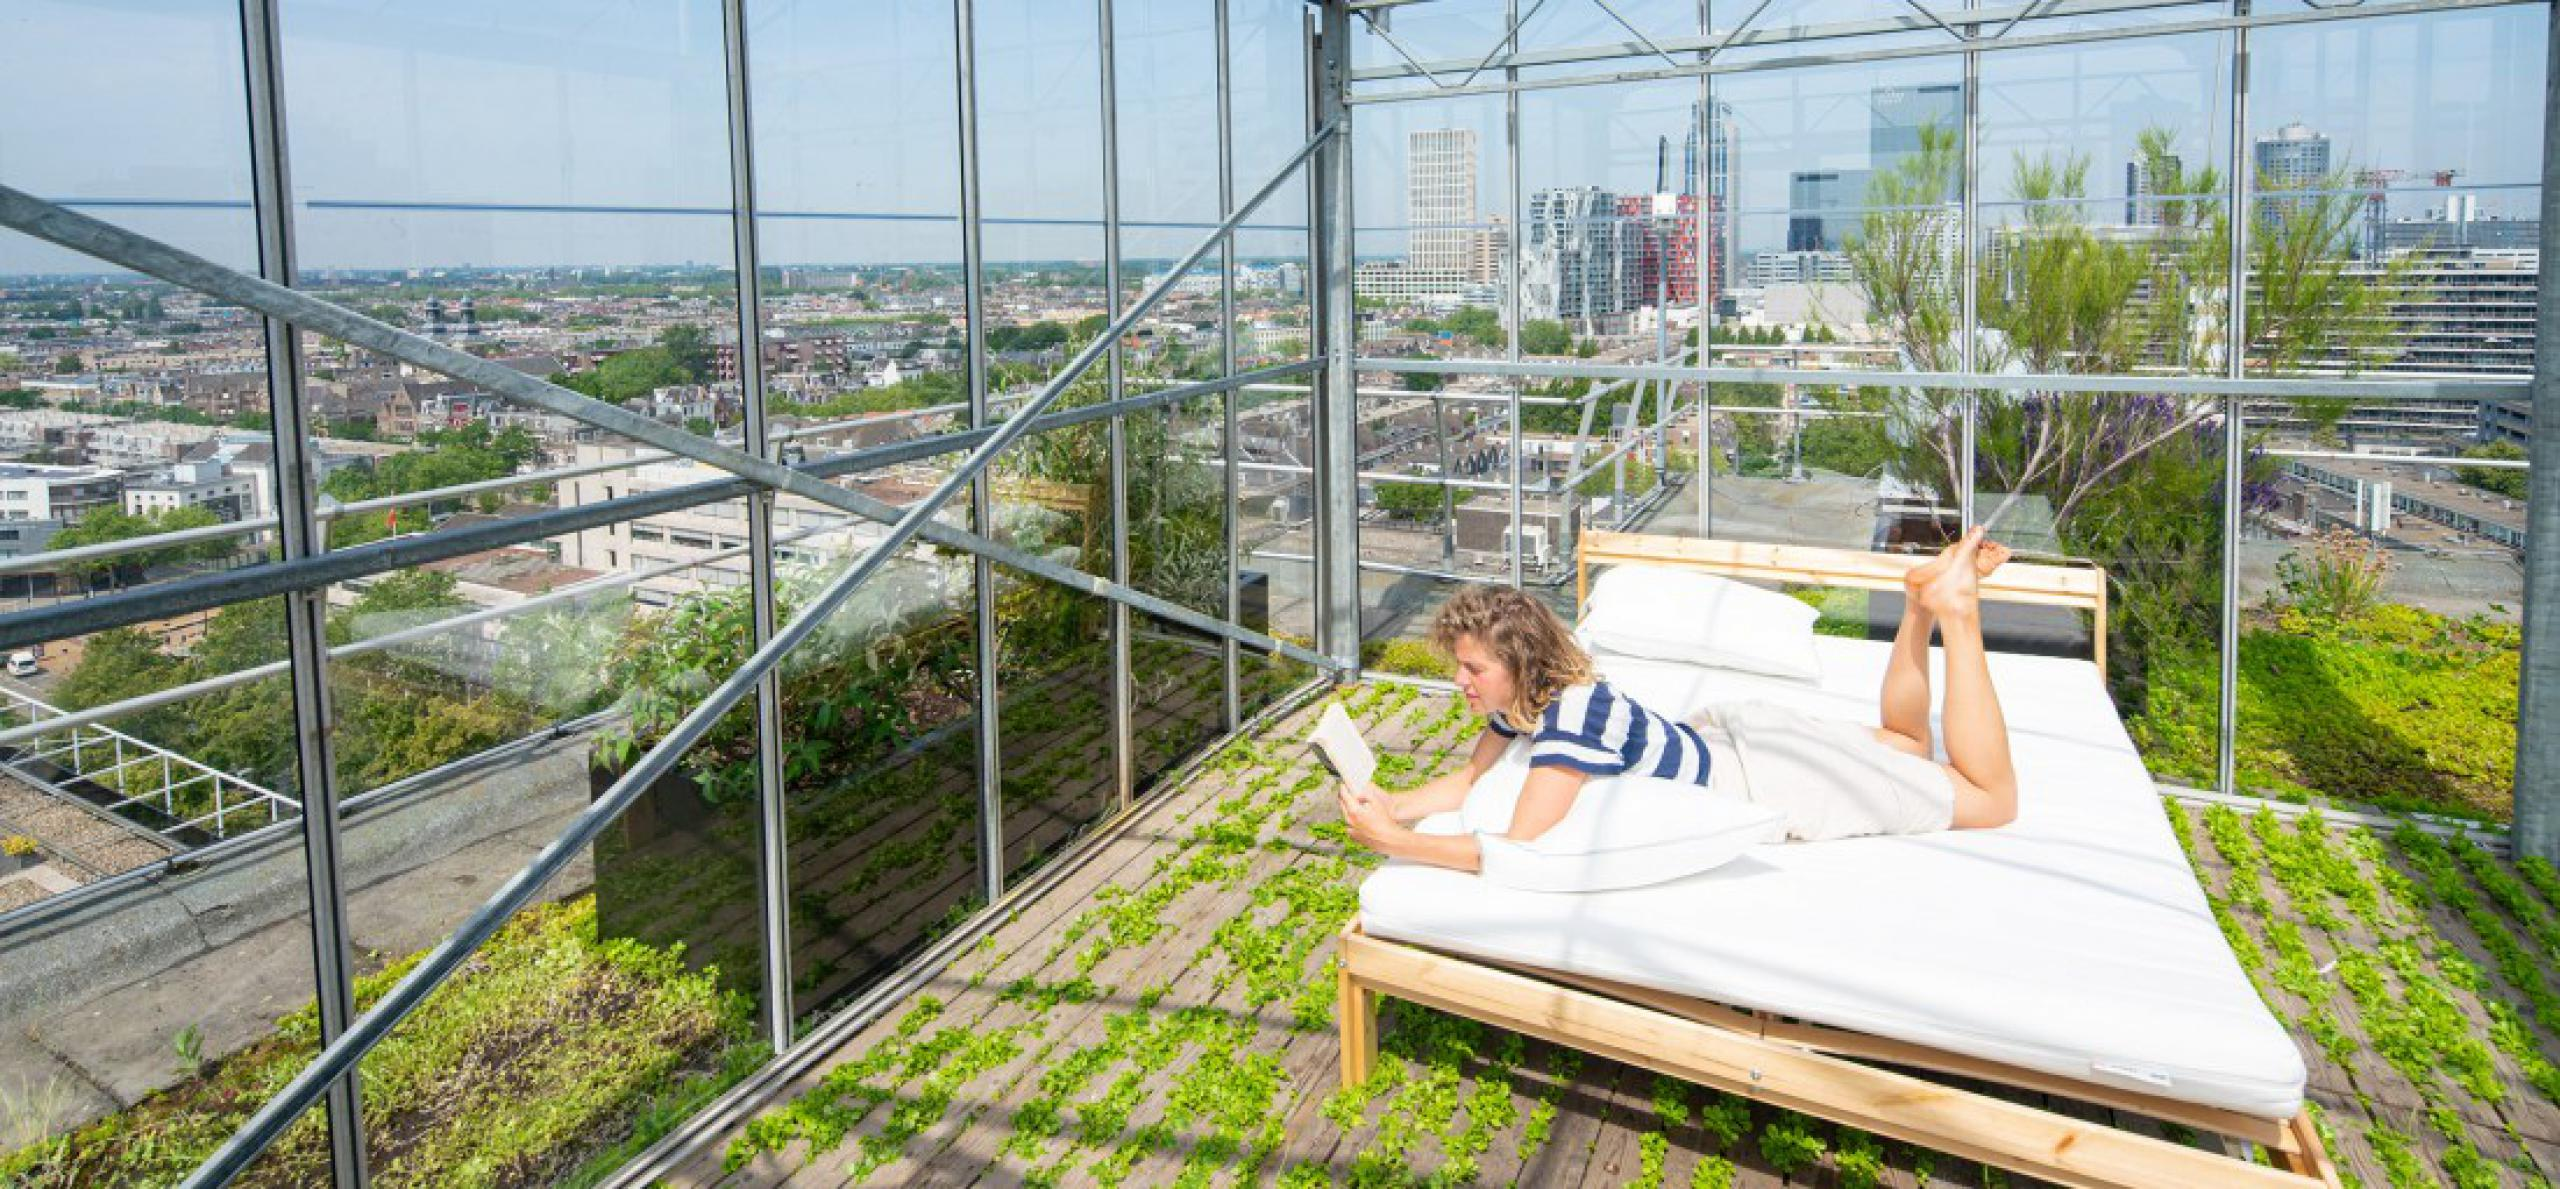 Rotterdamse Dakendagen